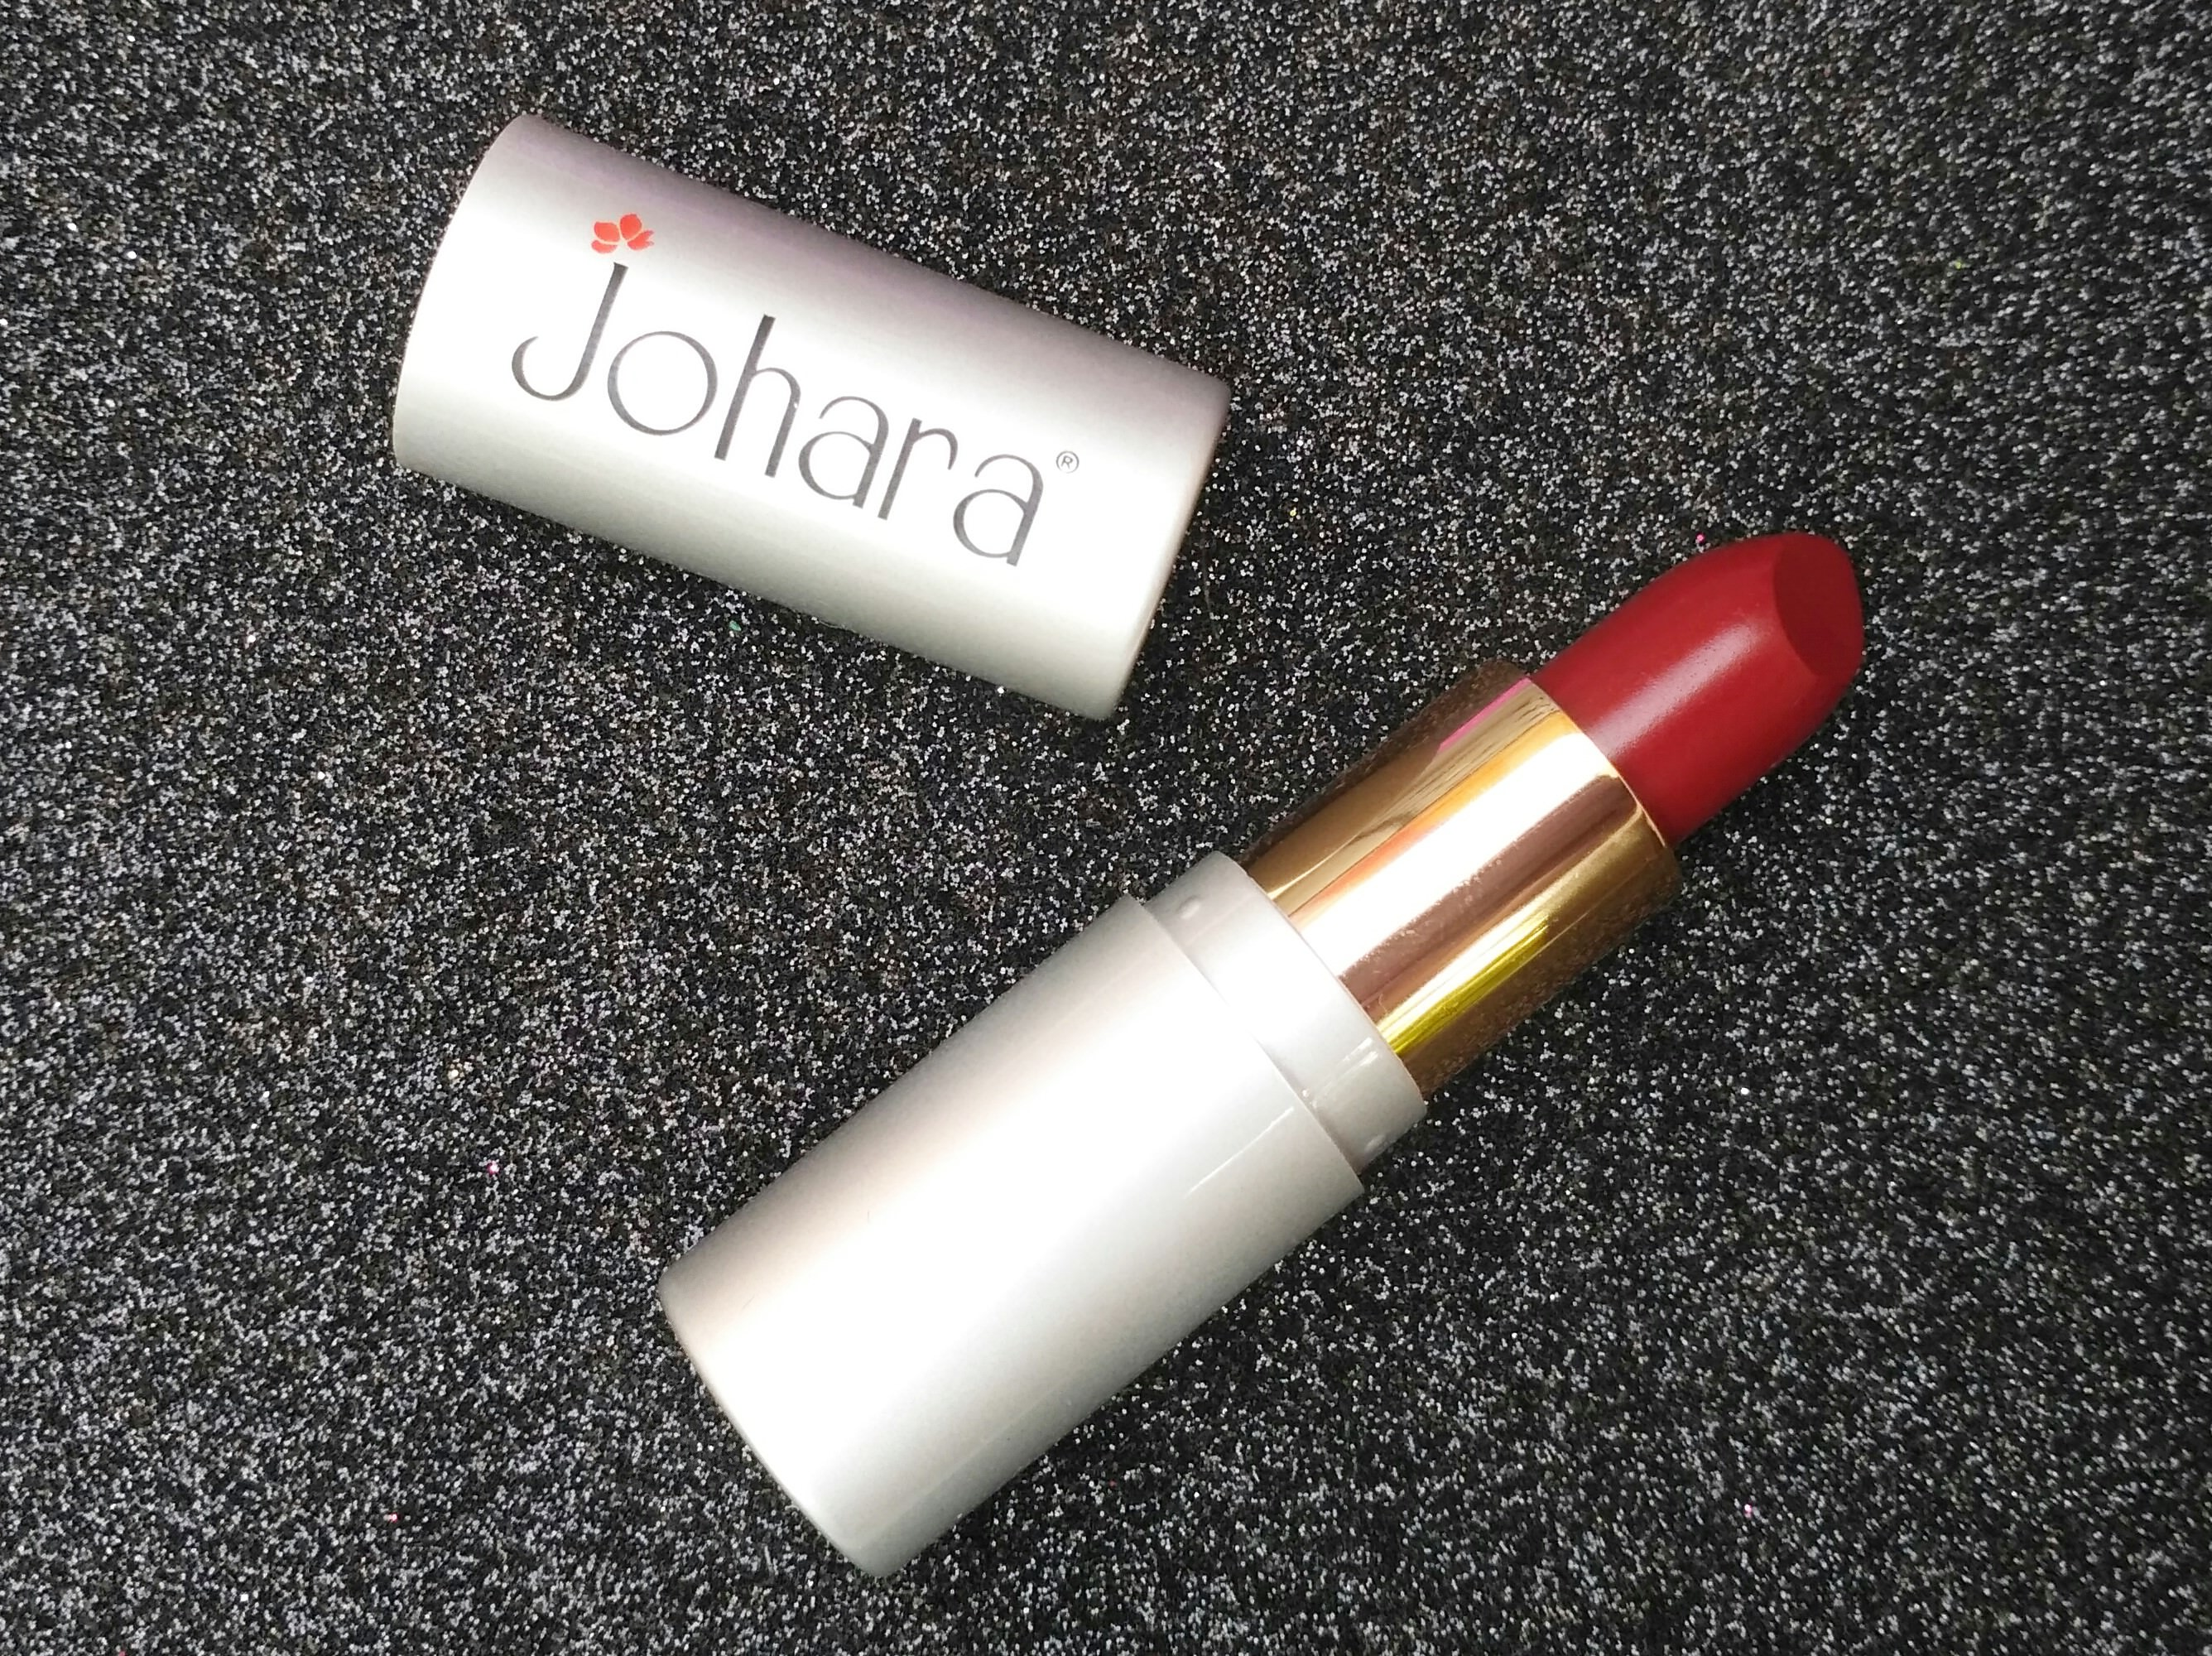 Johara Creme Rich Lip Color Review